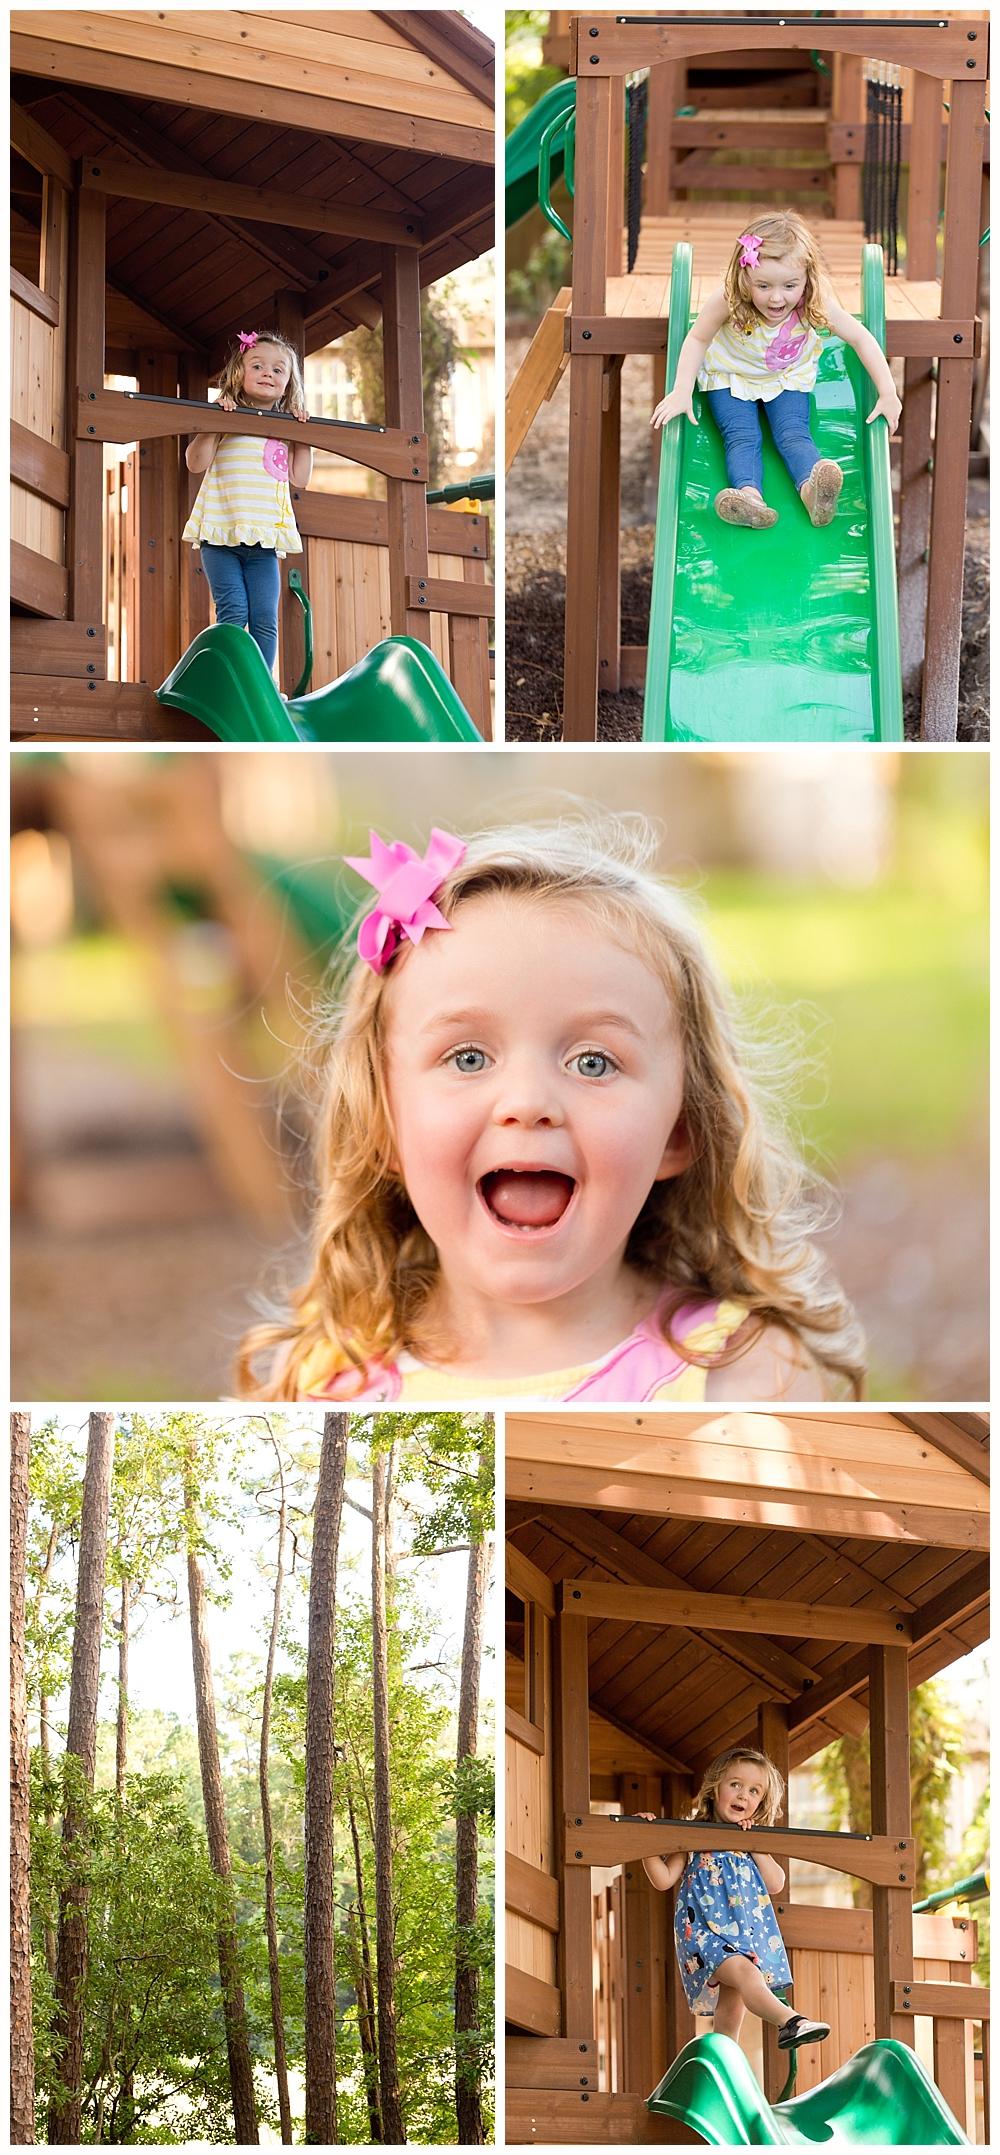 three-year-old girl playing on backyard playset